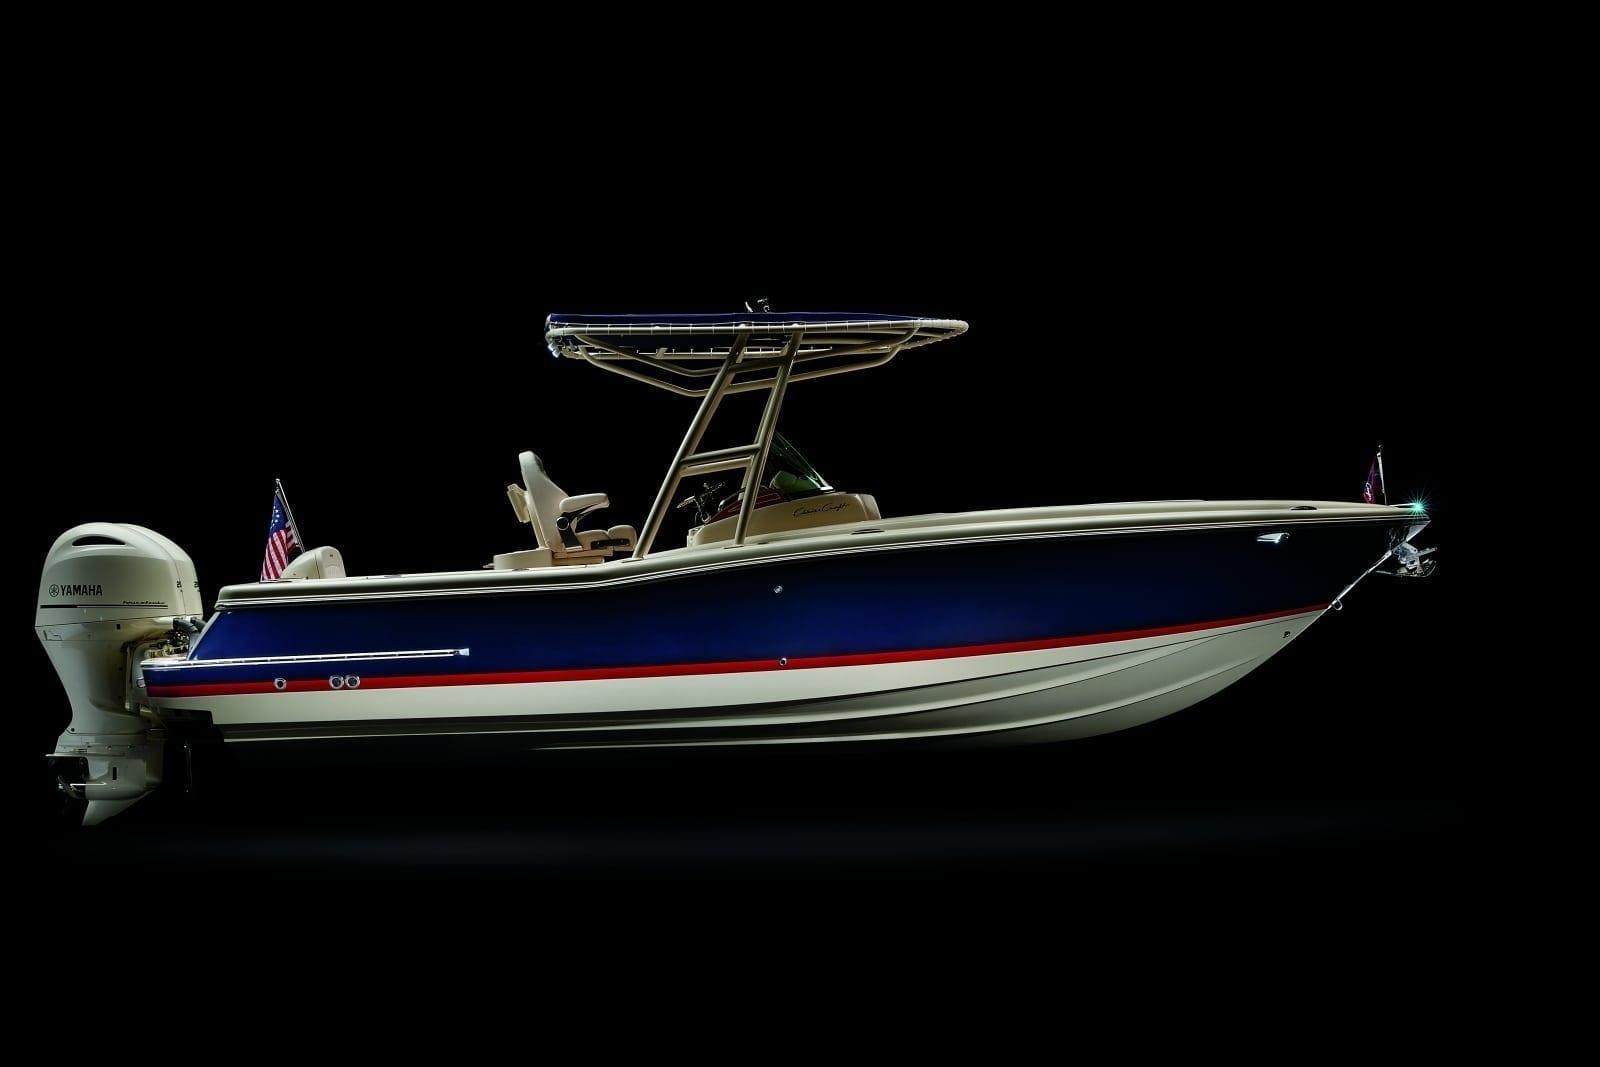 Chris Craft Catalina 36 Starboard Profile